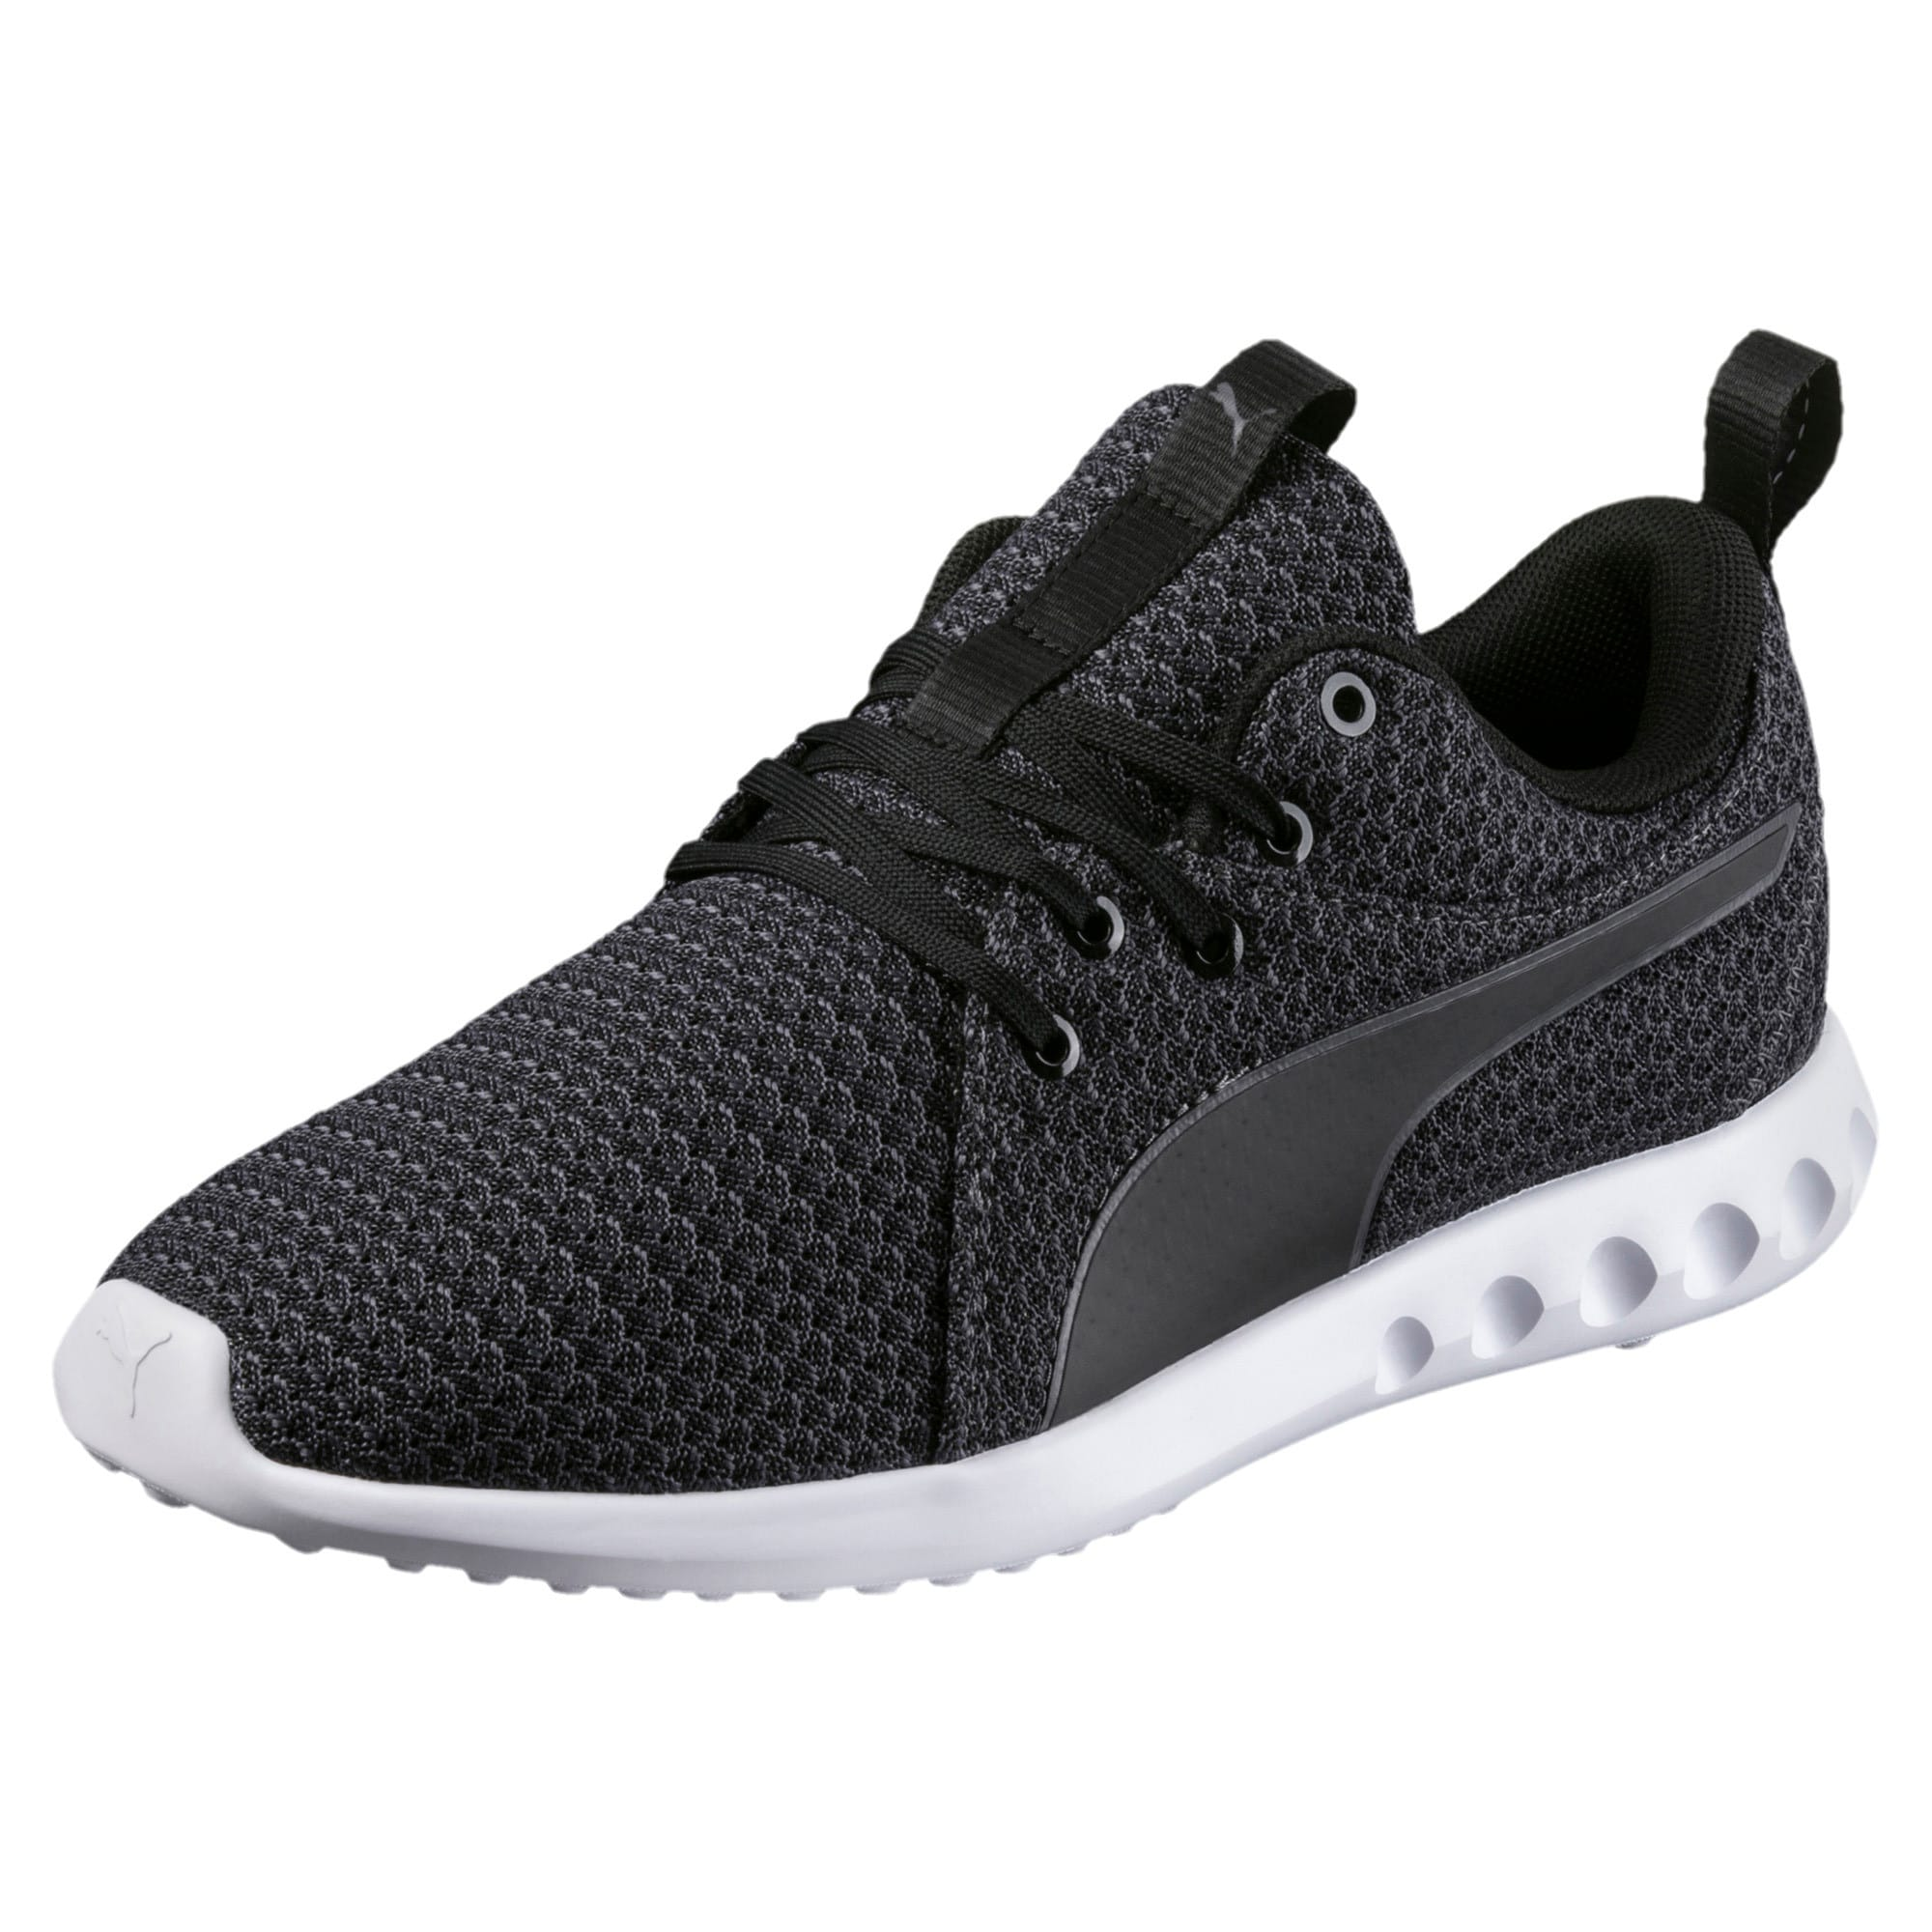 Thumbnail 1 of Carson 2 Knit Women's Running Shoes, Puma Black-Periscope, medium